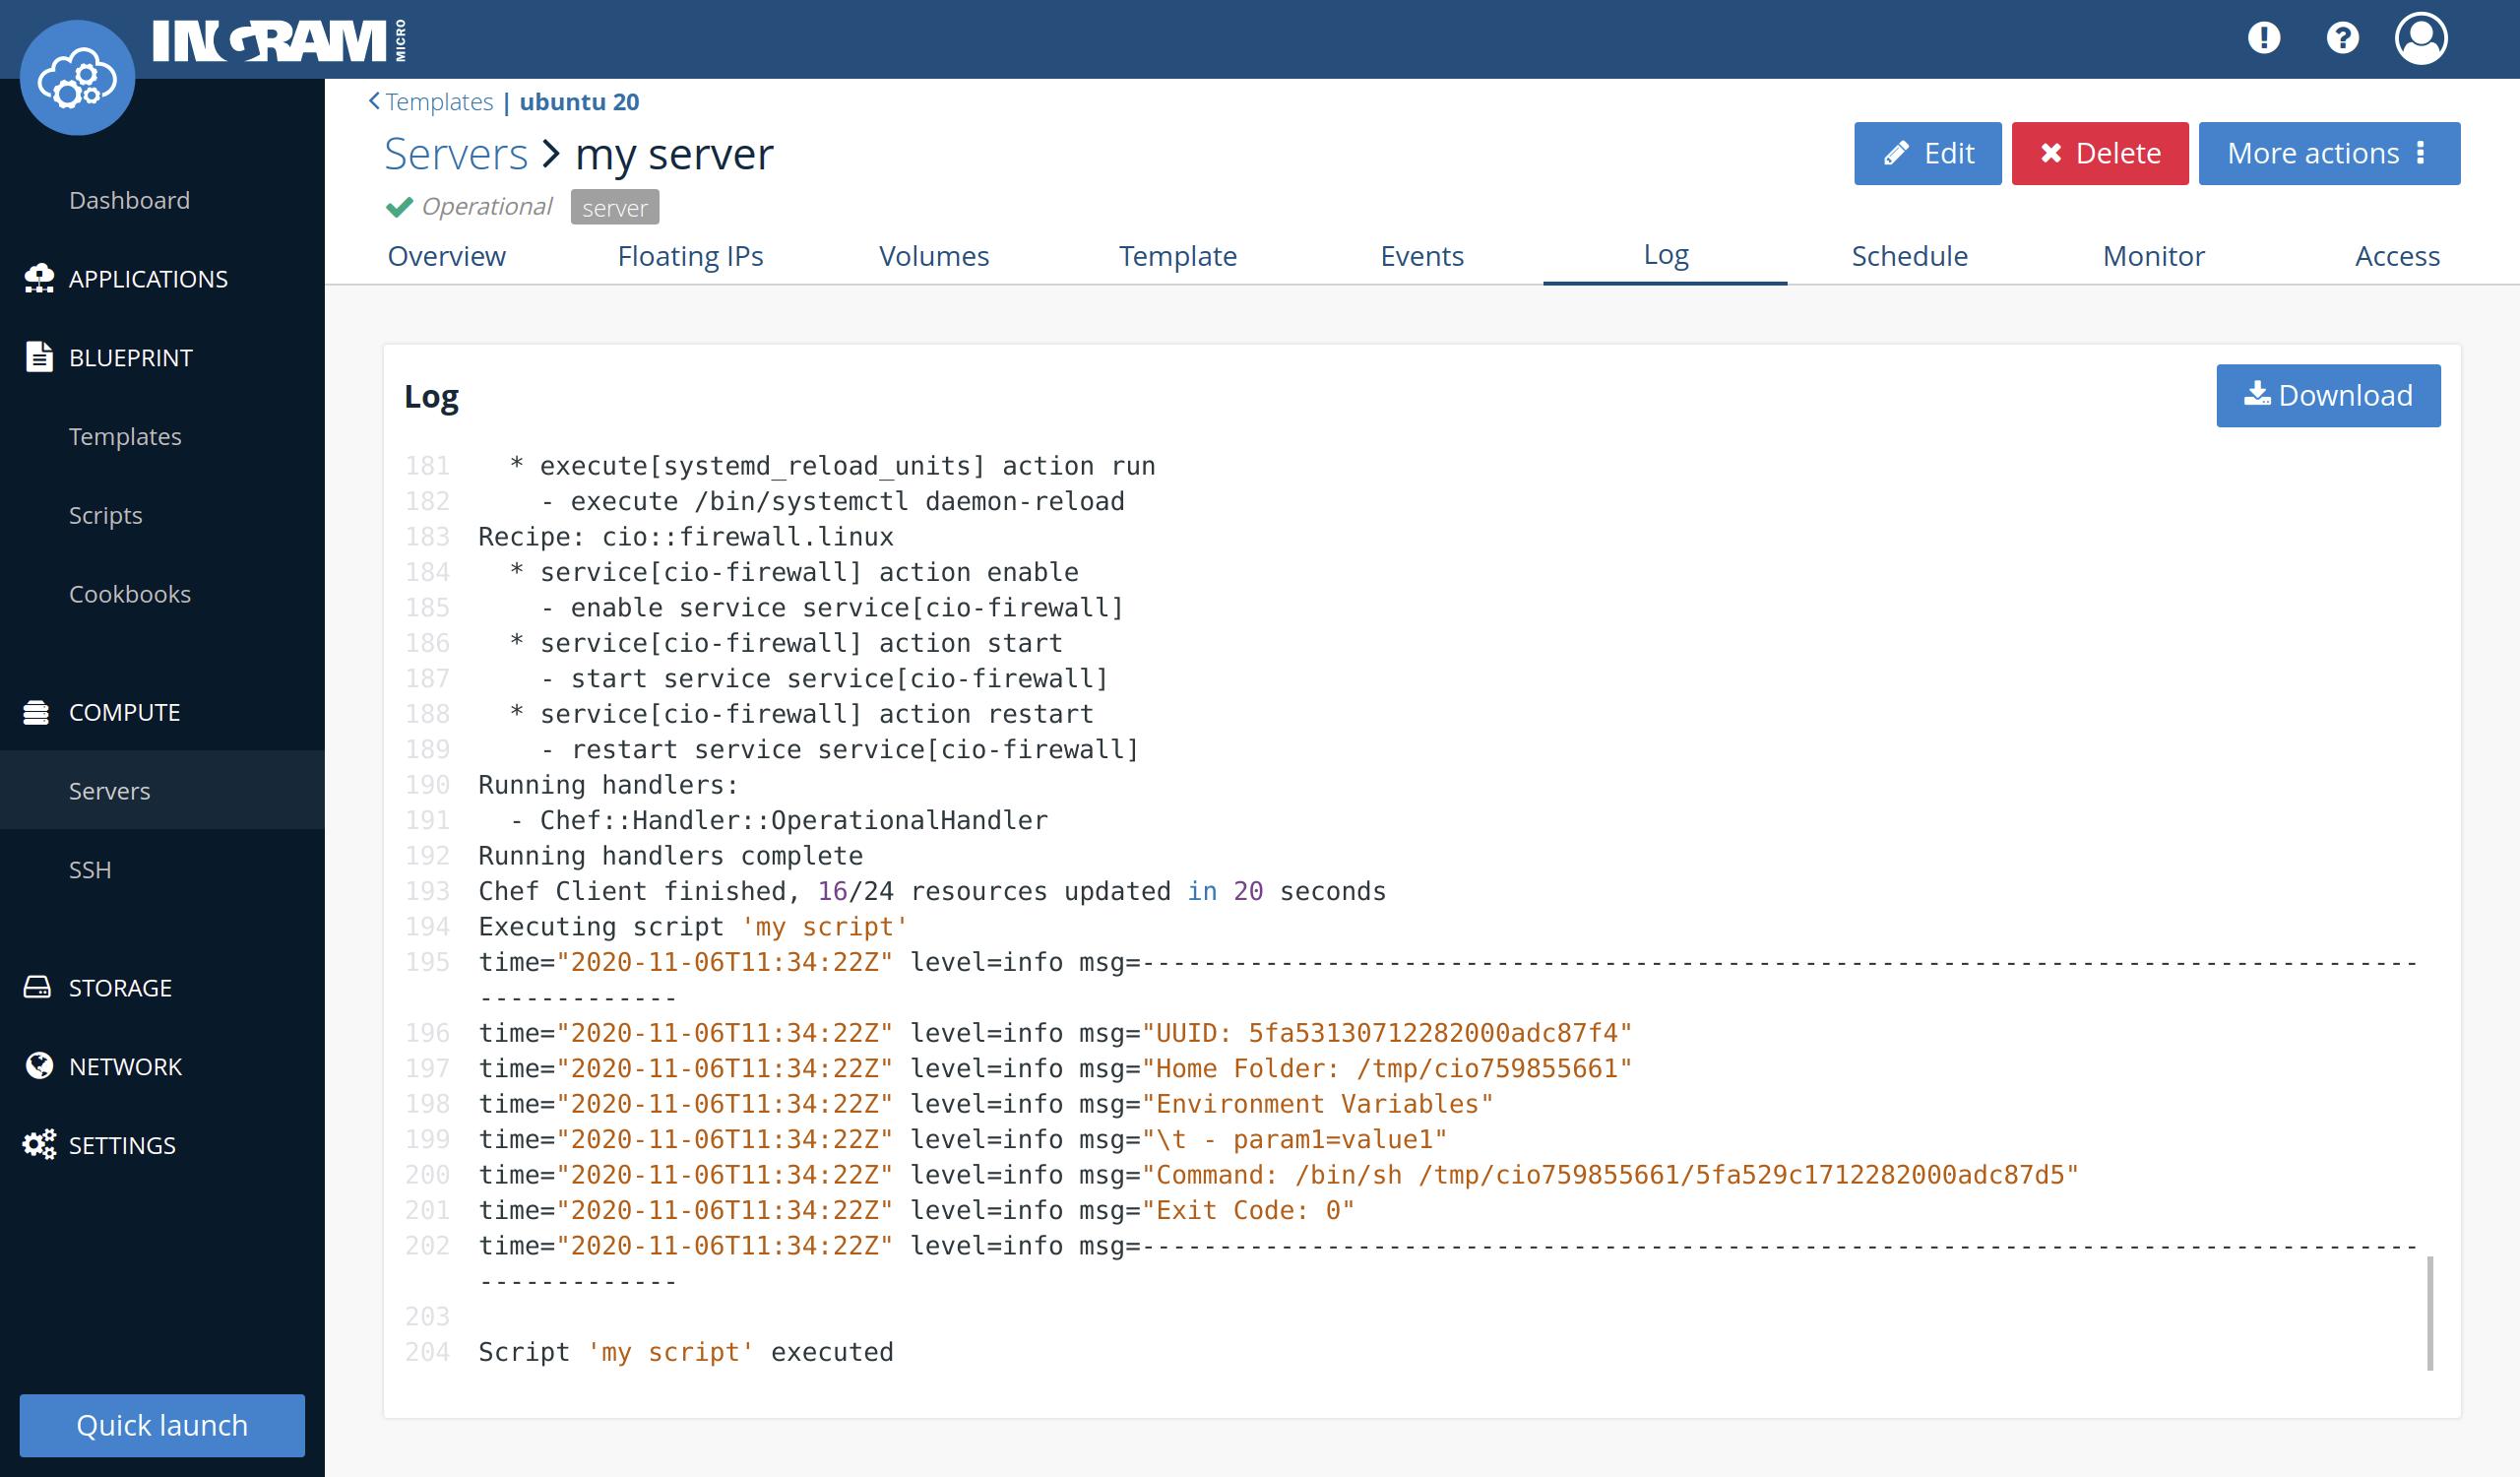 Template server operational script run